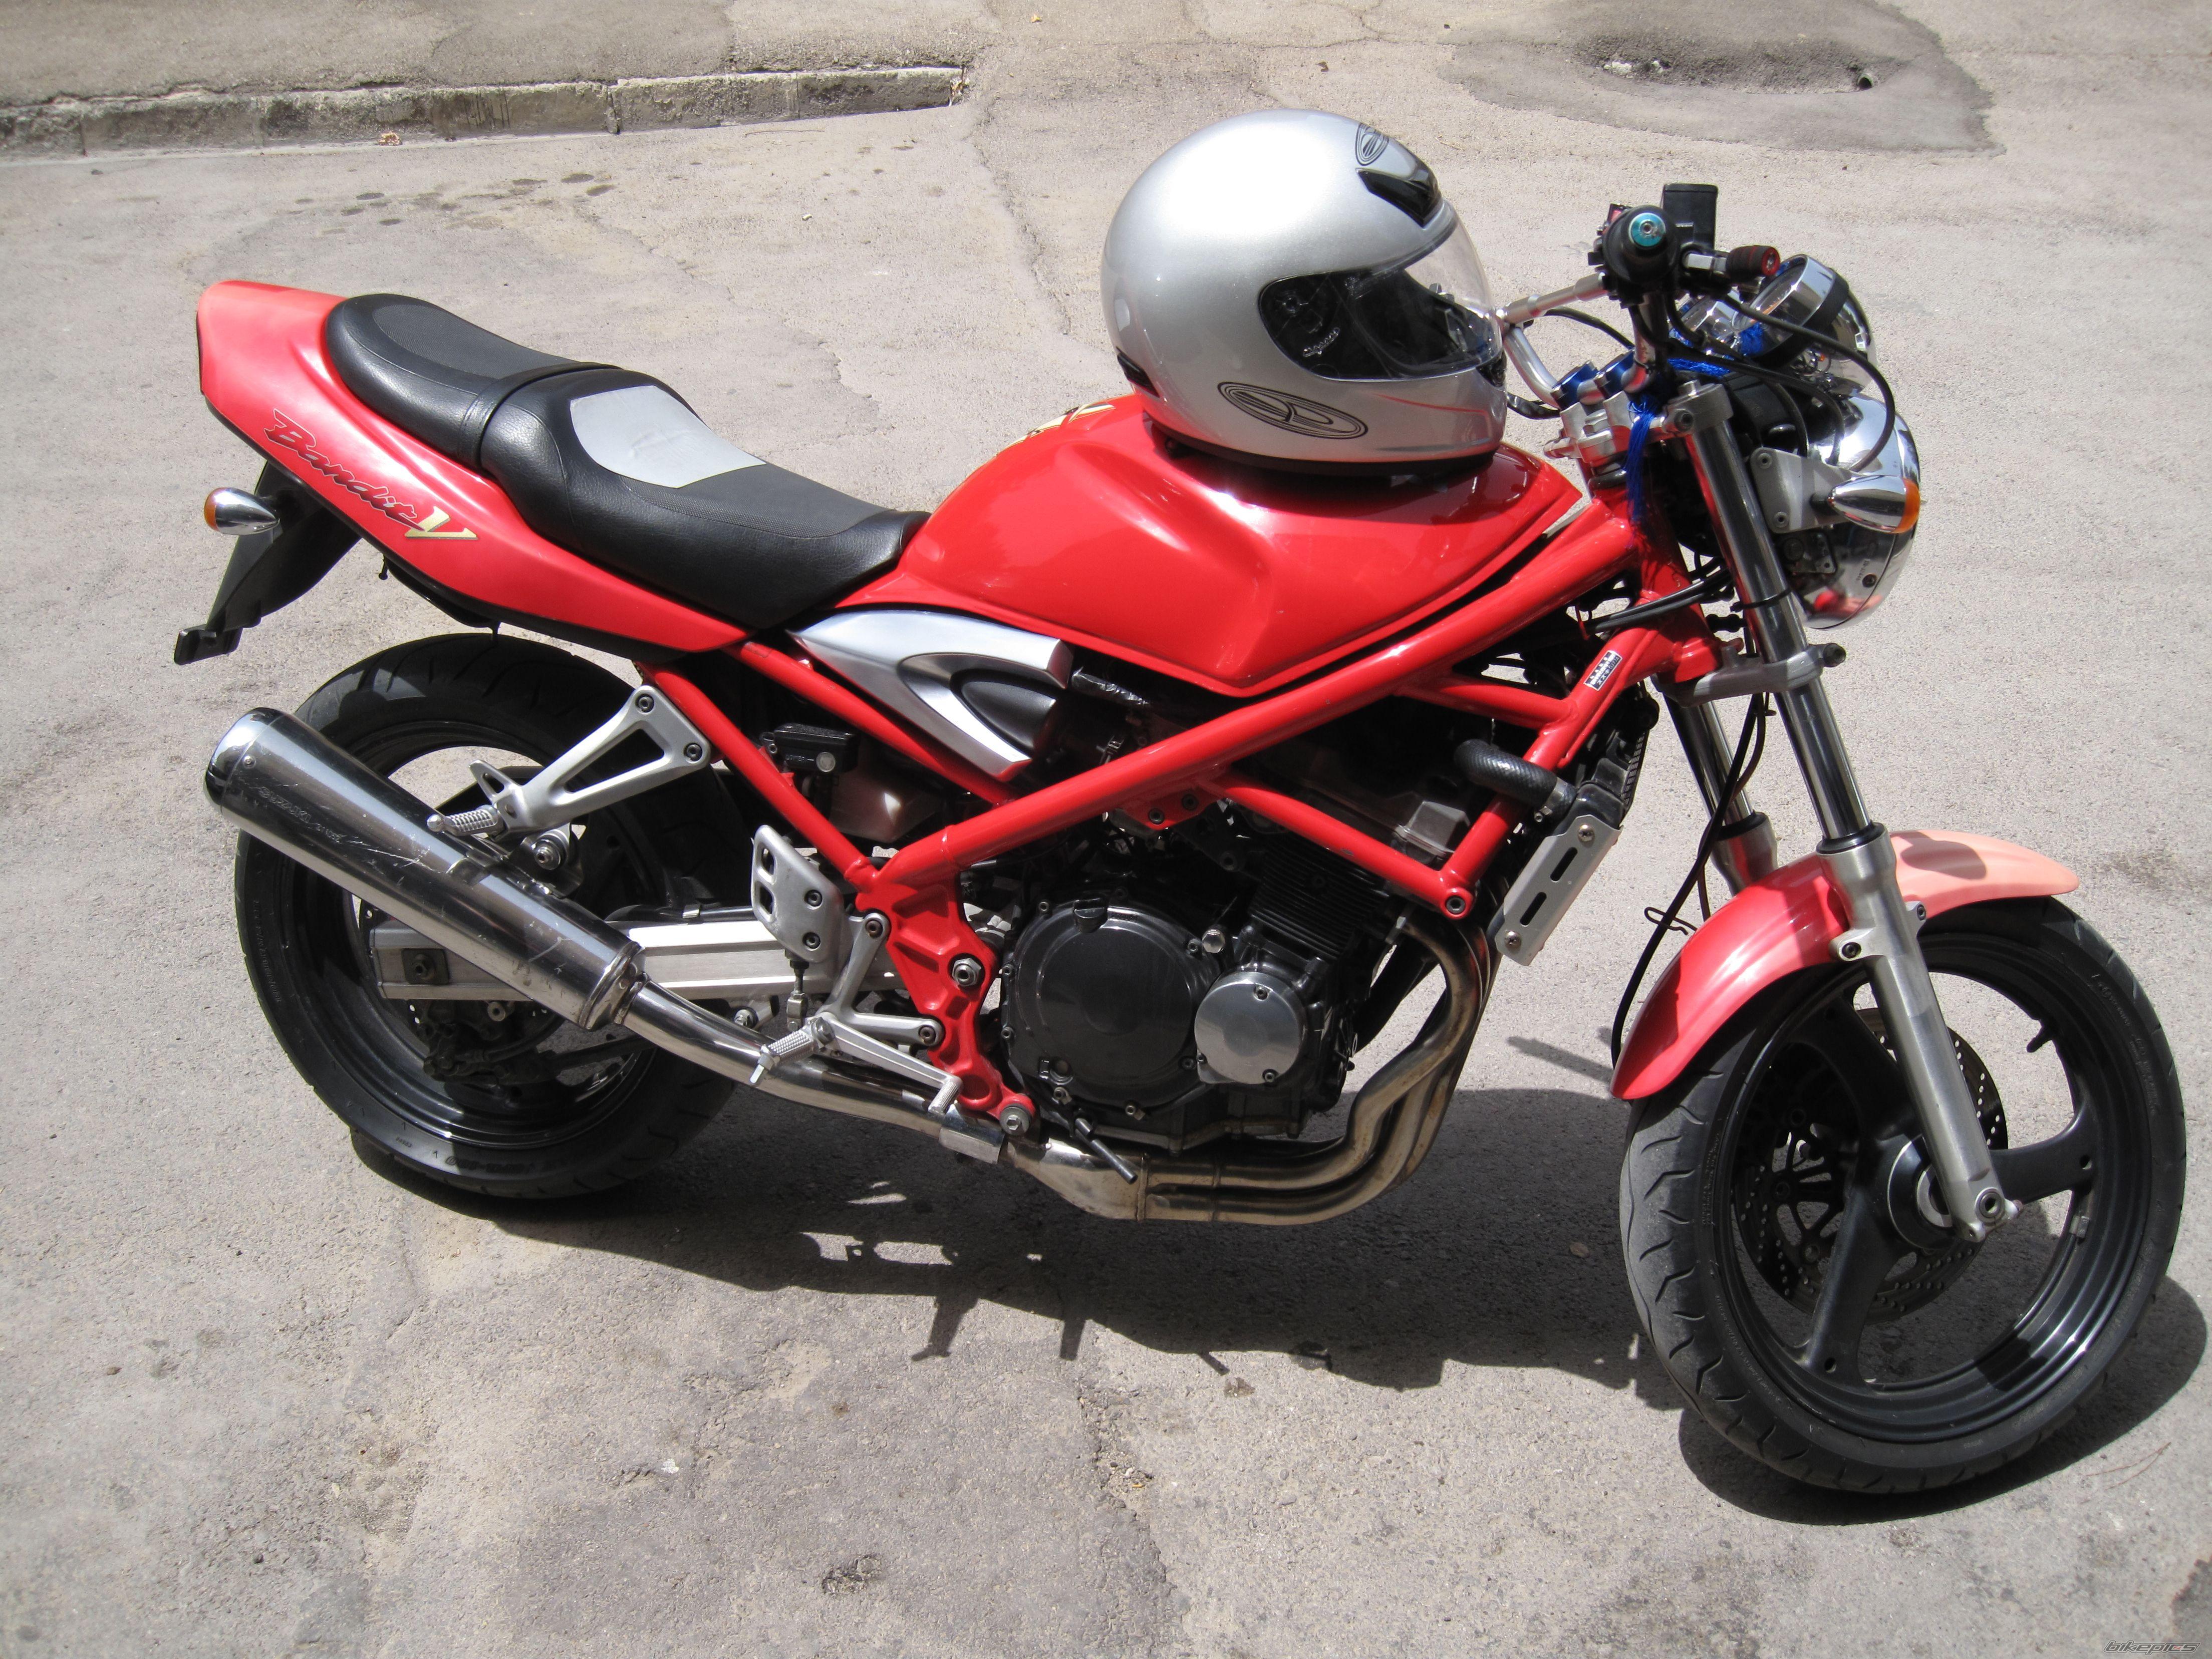 Мотоцикл Suzuki Bandit (Сузуки Бандит) GSF 250 краткий обзор